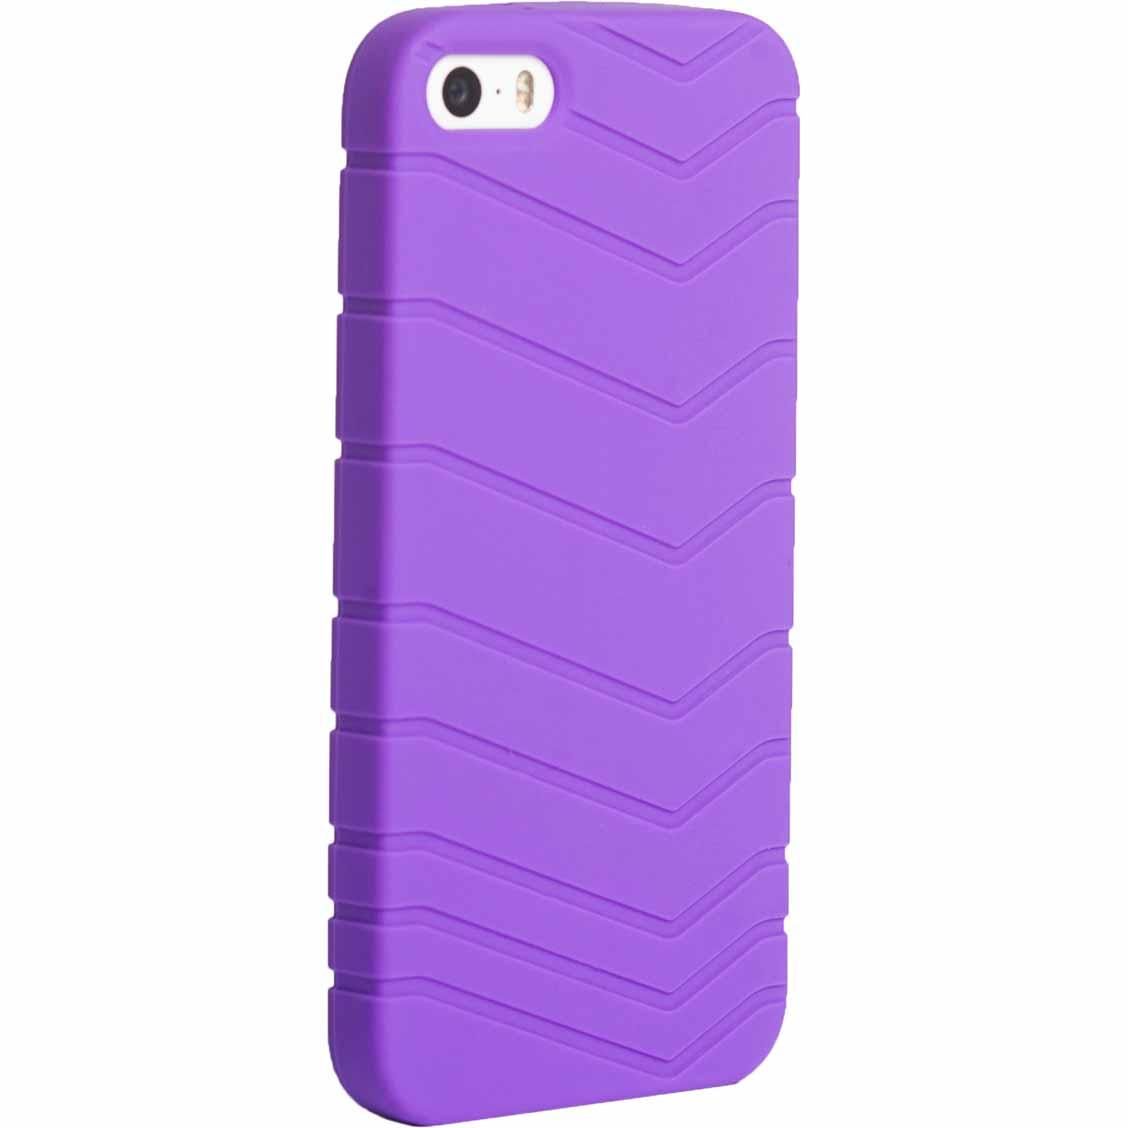 Agent 18 Velocity Phone Case for iPhone 5/5s - Purple